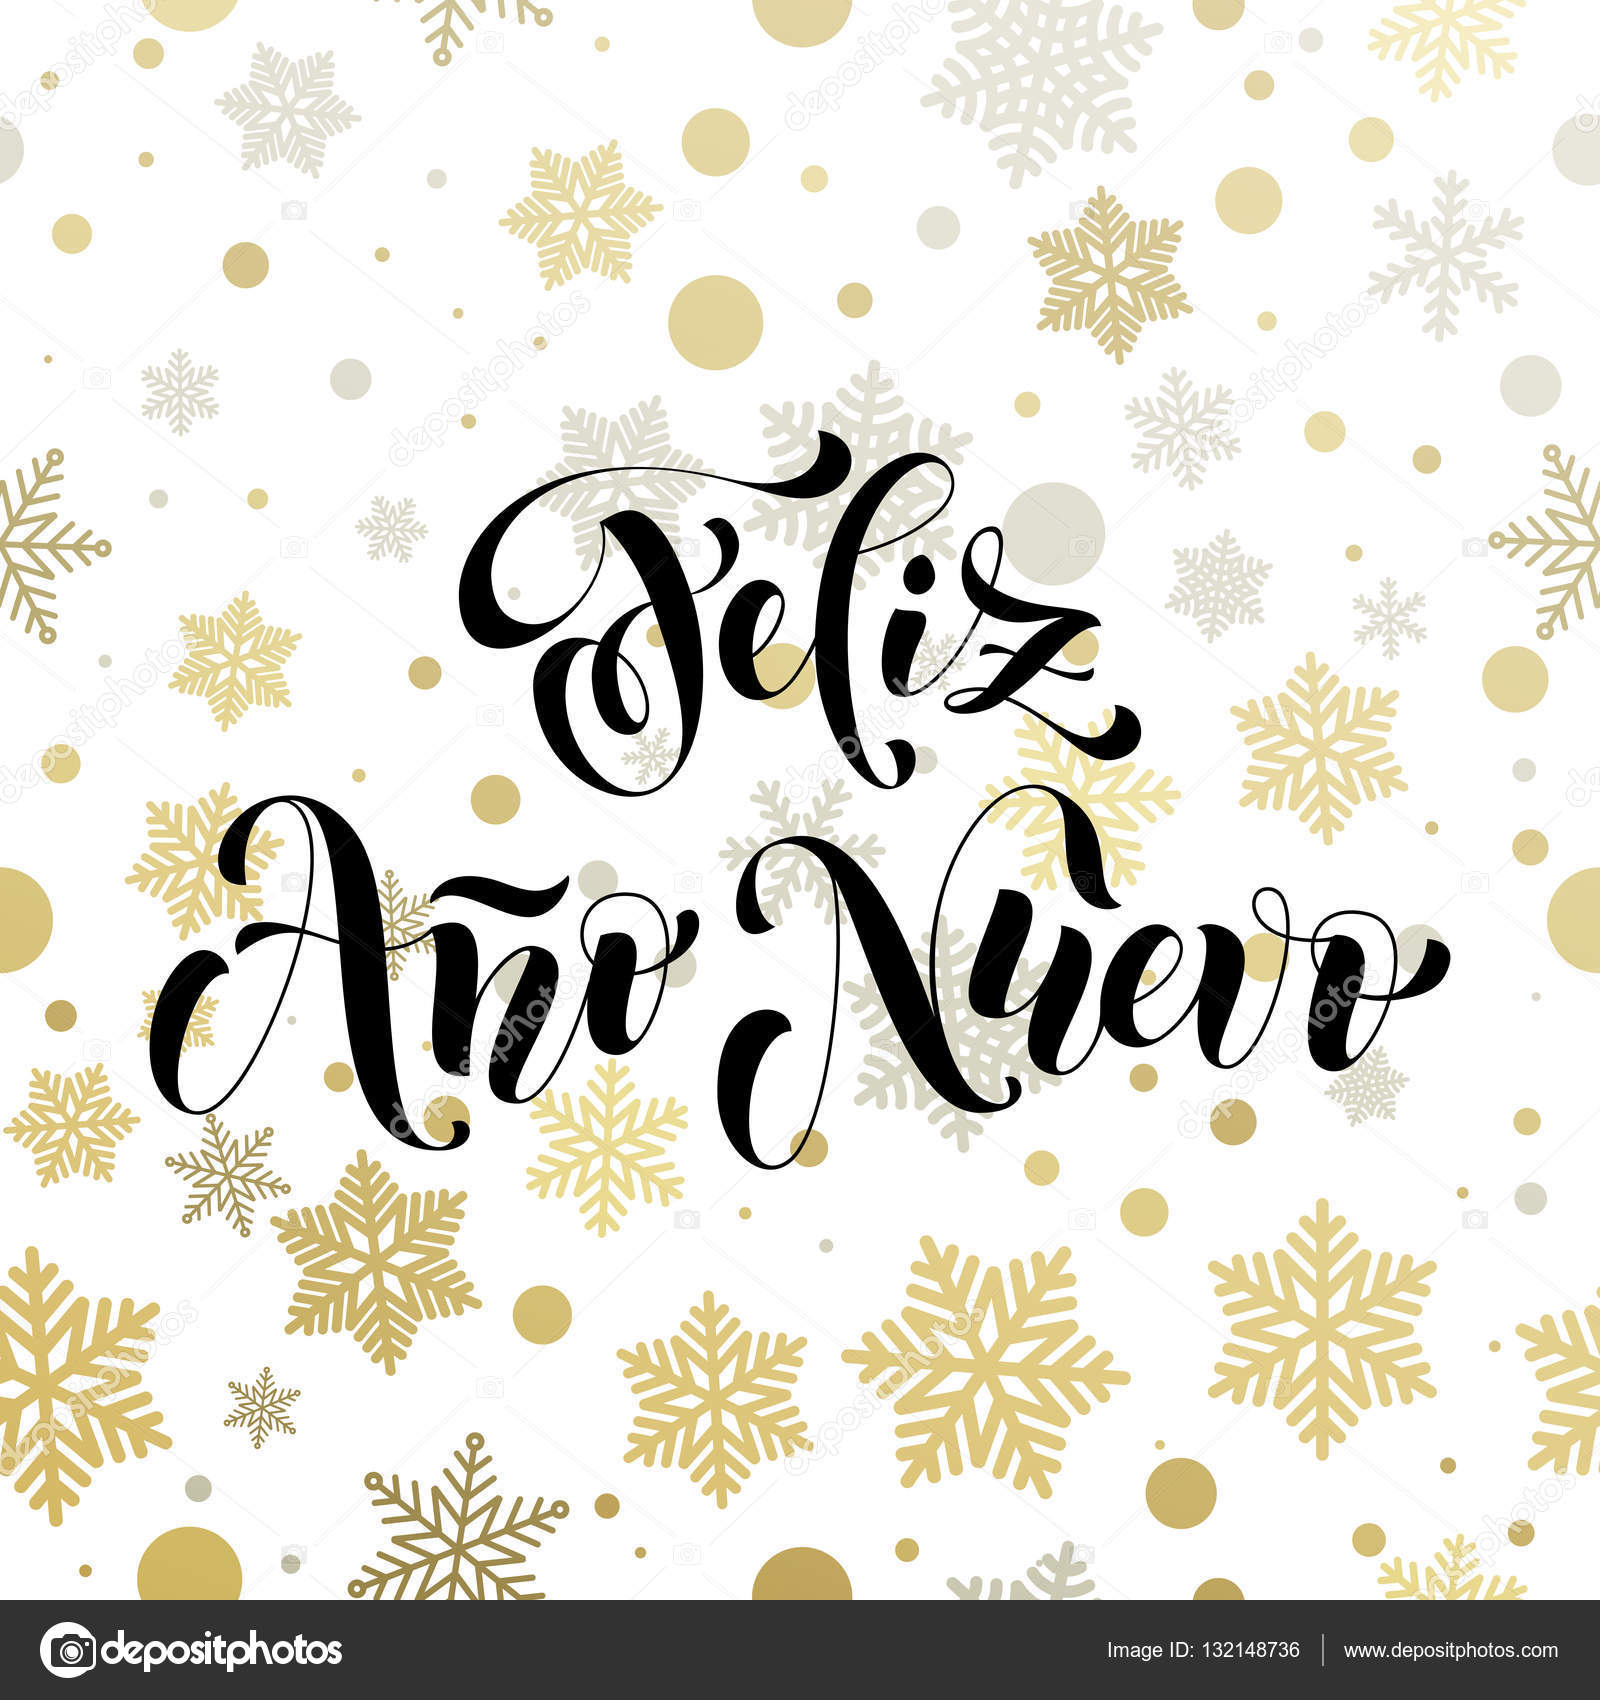 New Year In Spanish Golden Text Feliz Ano Nuevo Greeting Stock